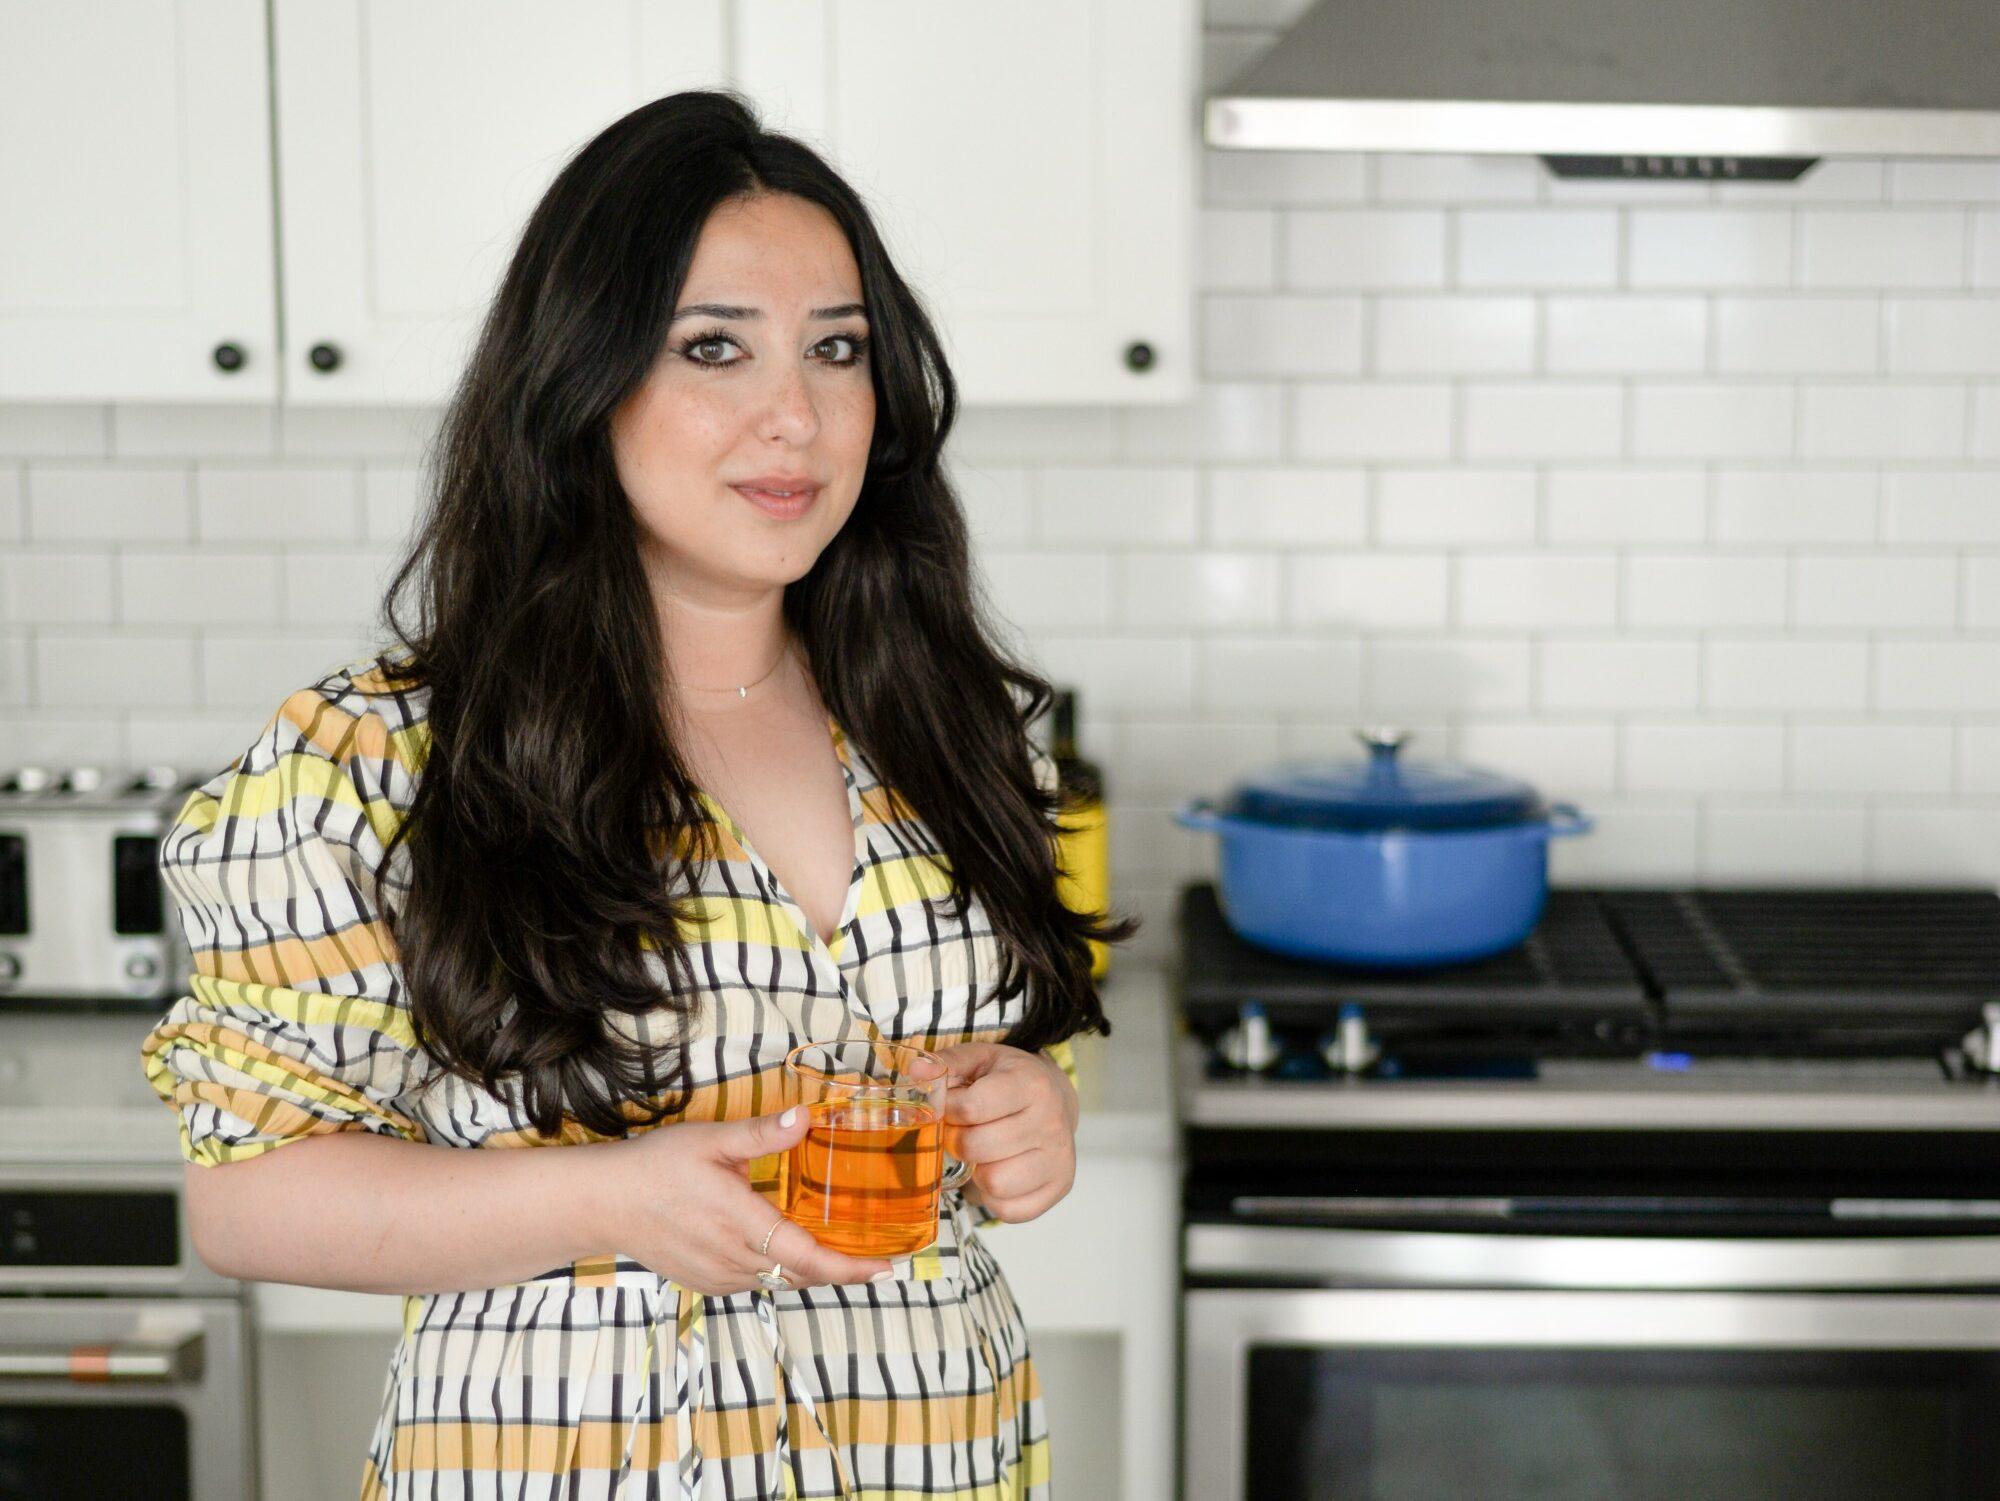 Tahmina Gaffer of Moonflower in Kitchen